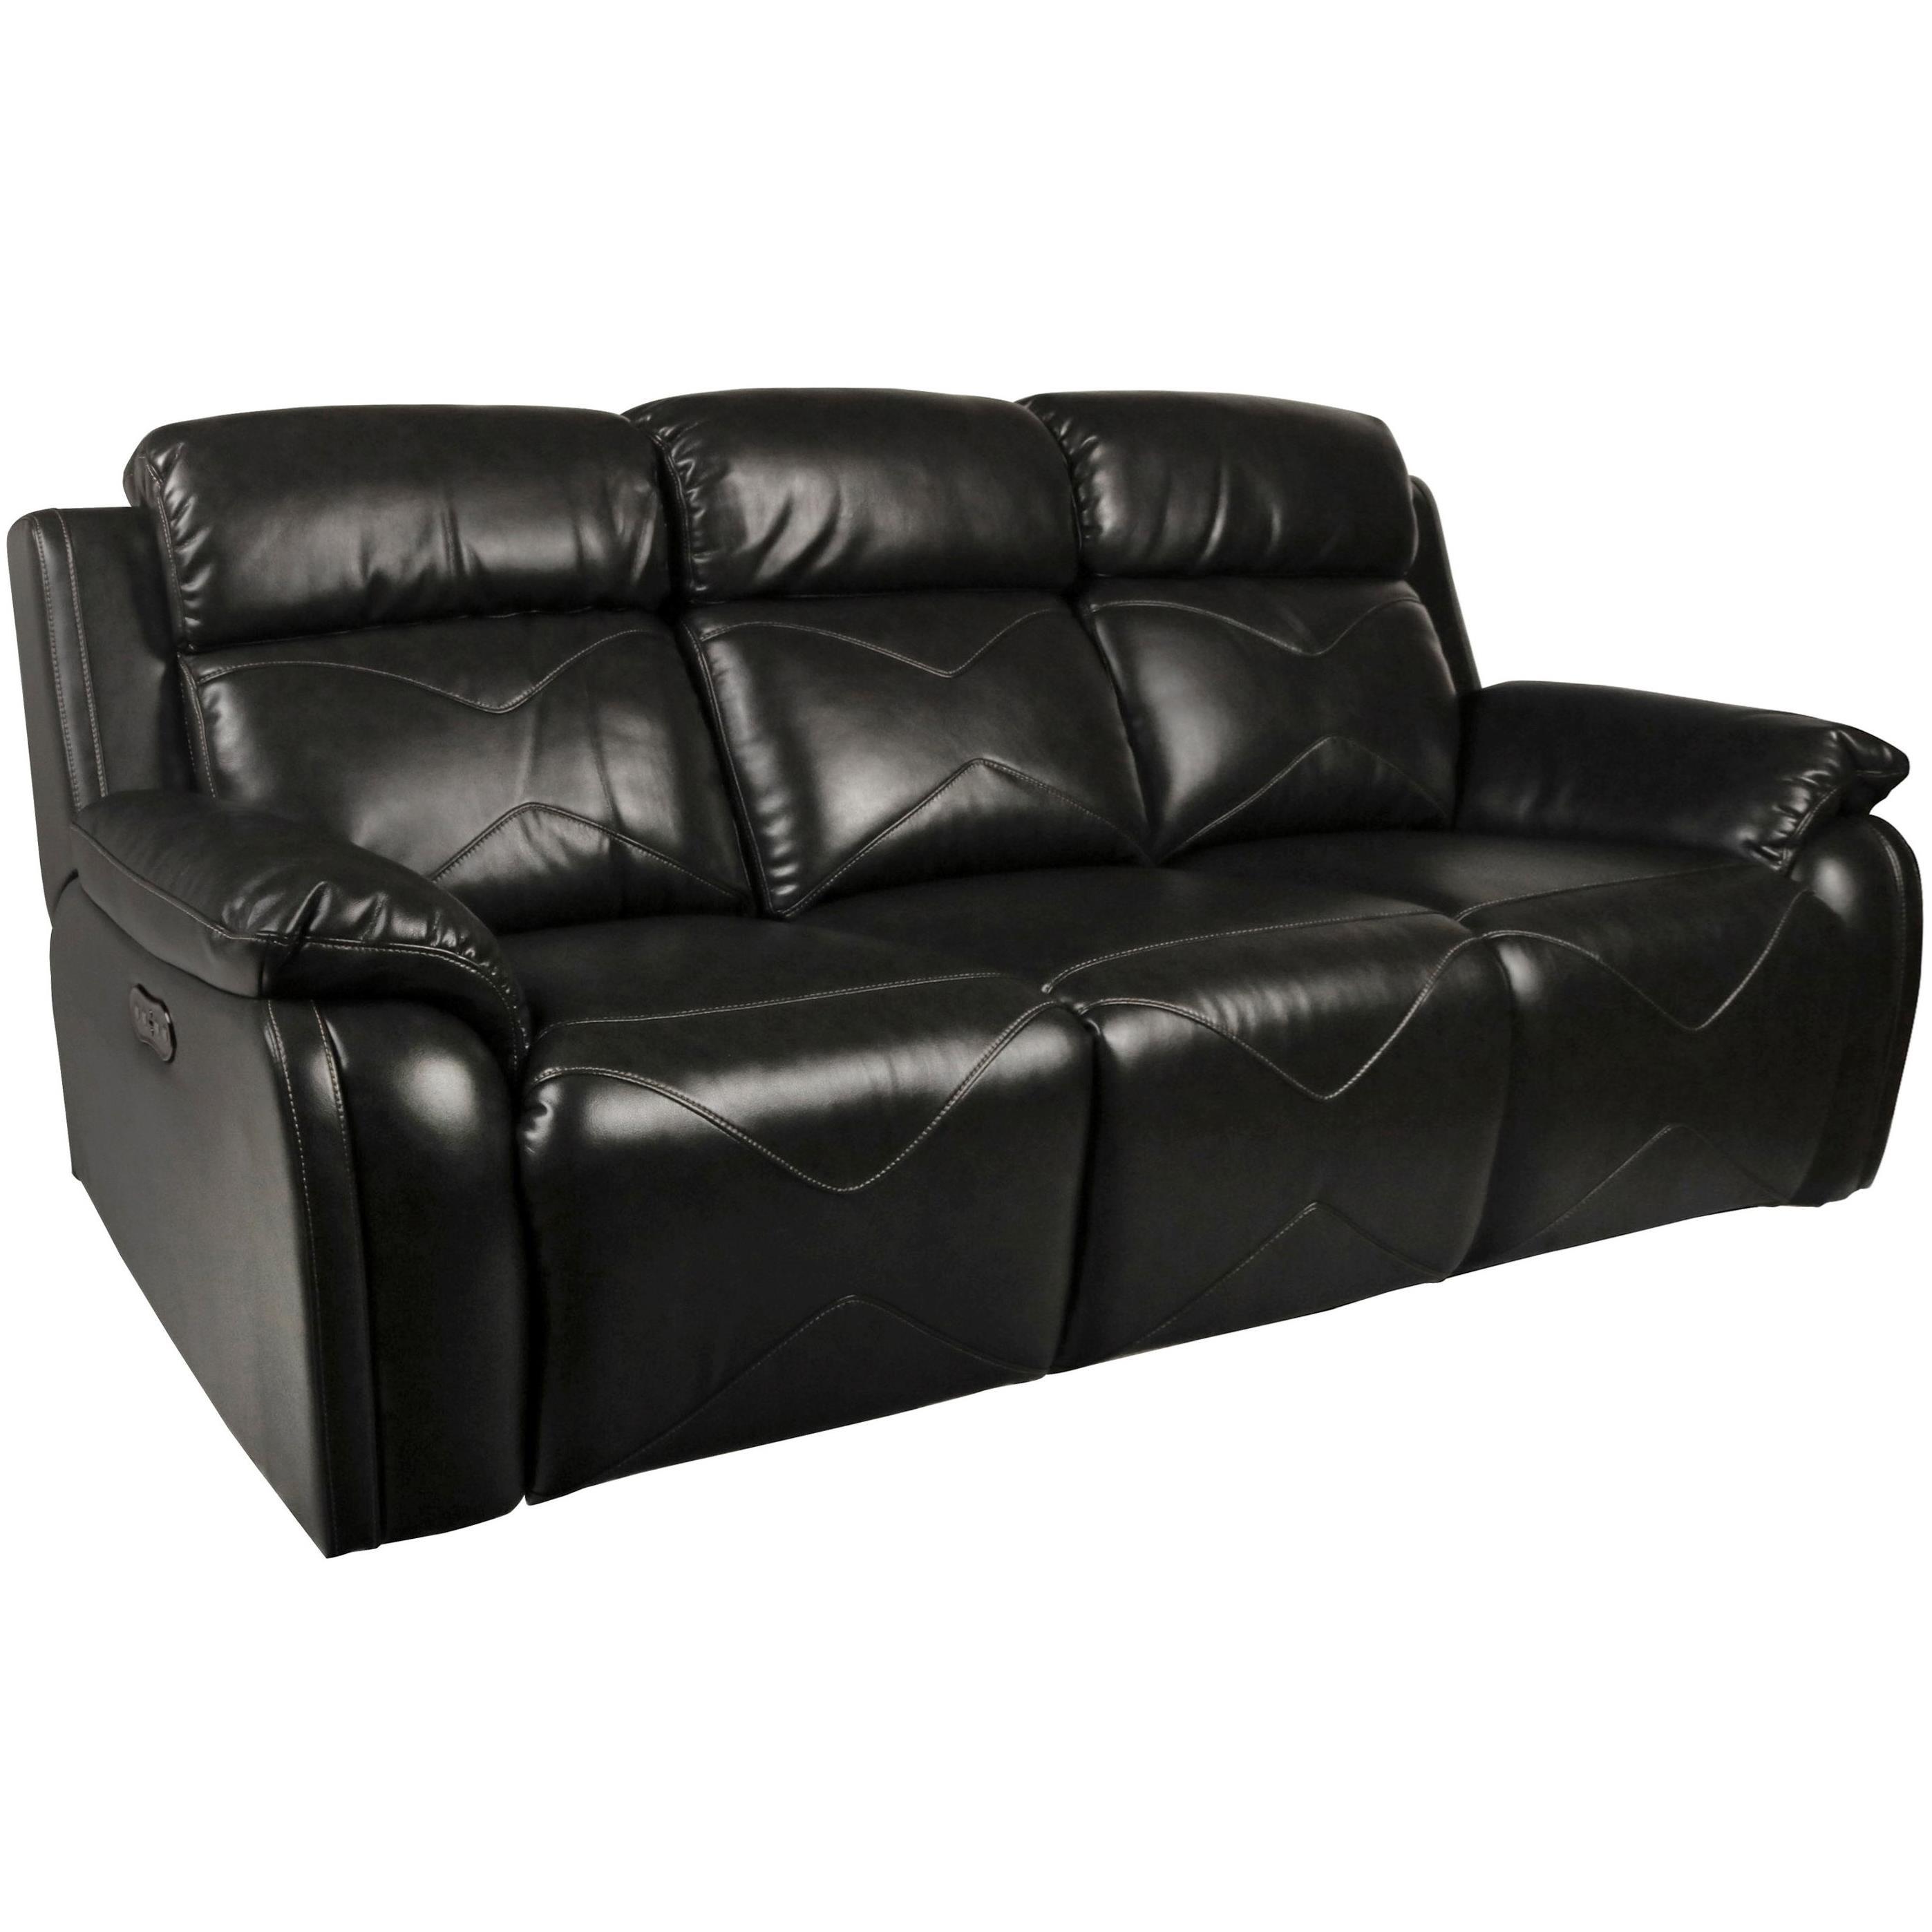 New Classic VigoPower Reclining Sofa With Power Headrest ...